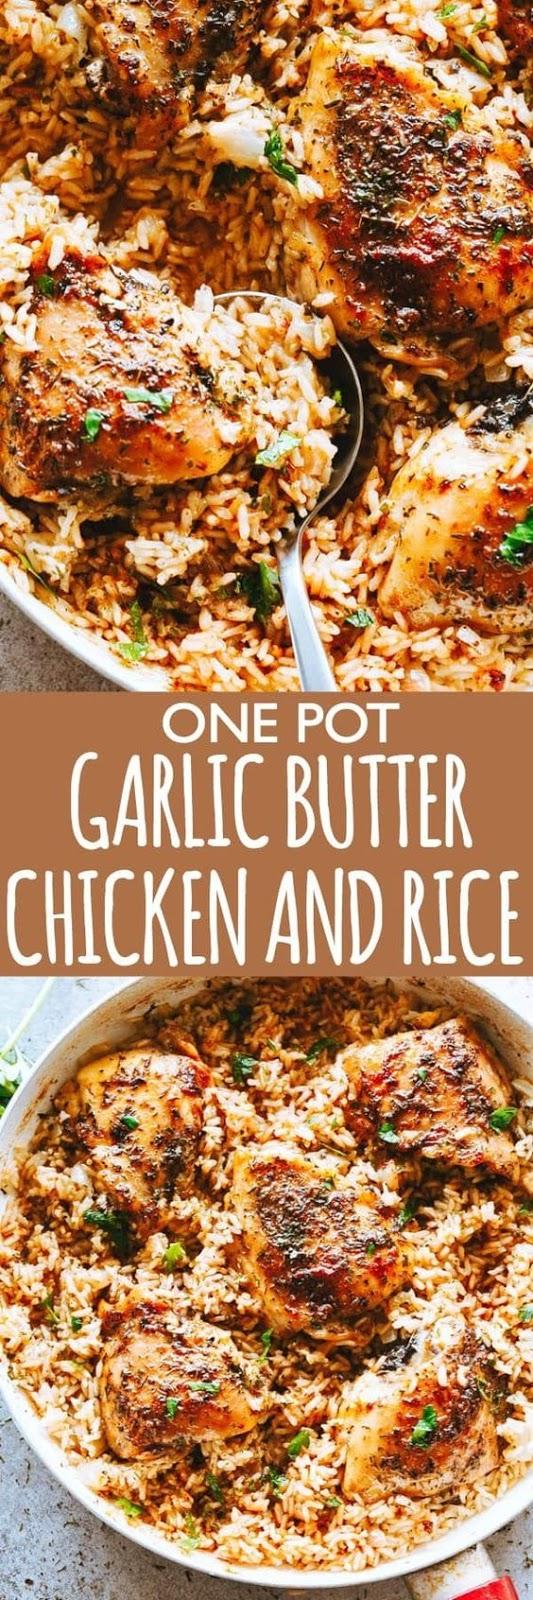 Garlic Butter Chicken and Rice Recipe